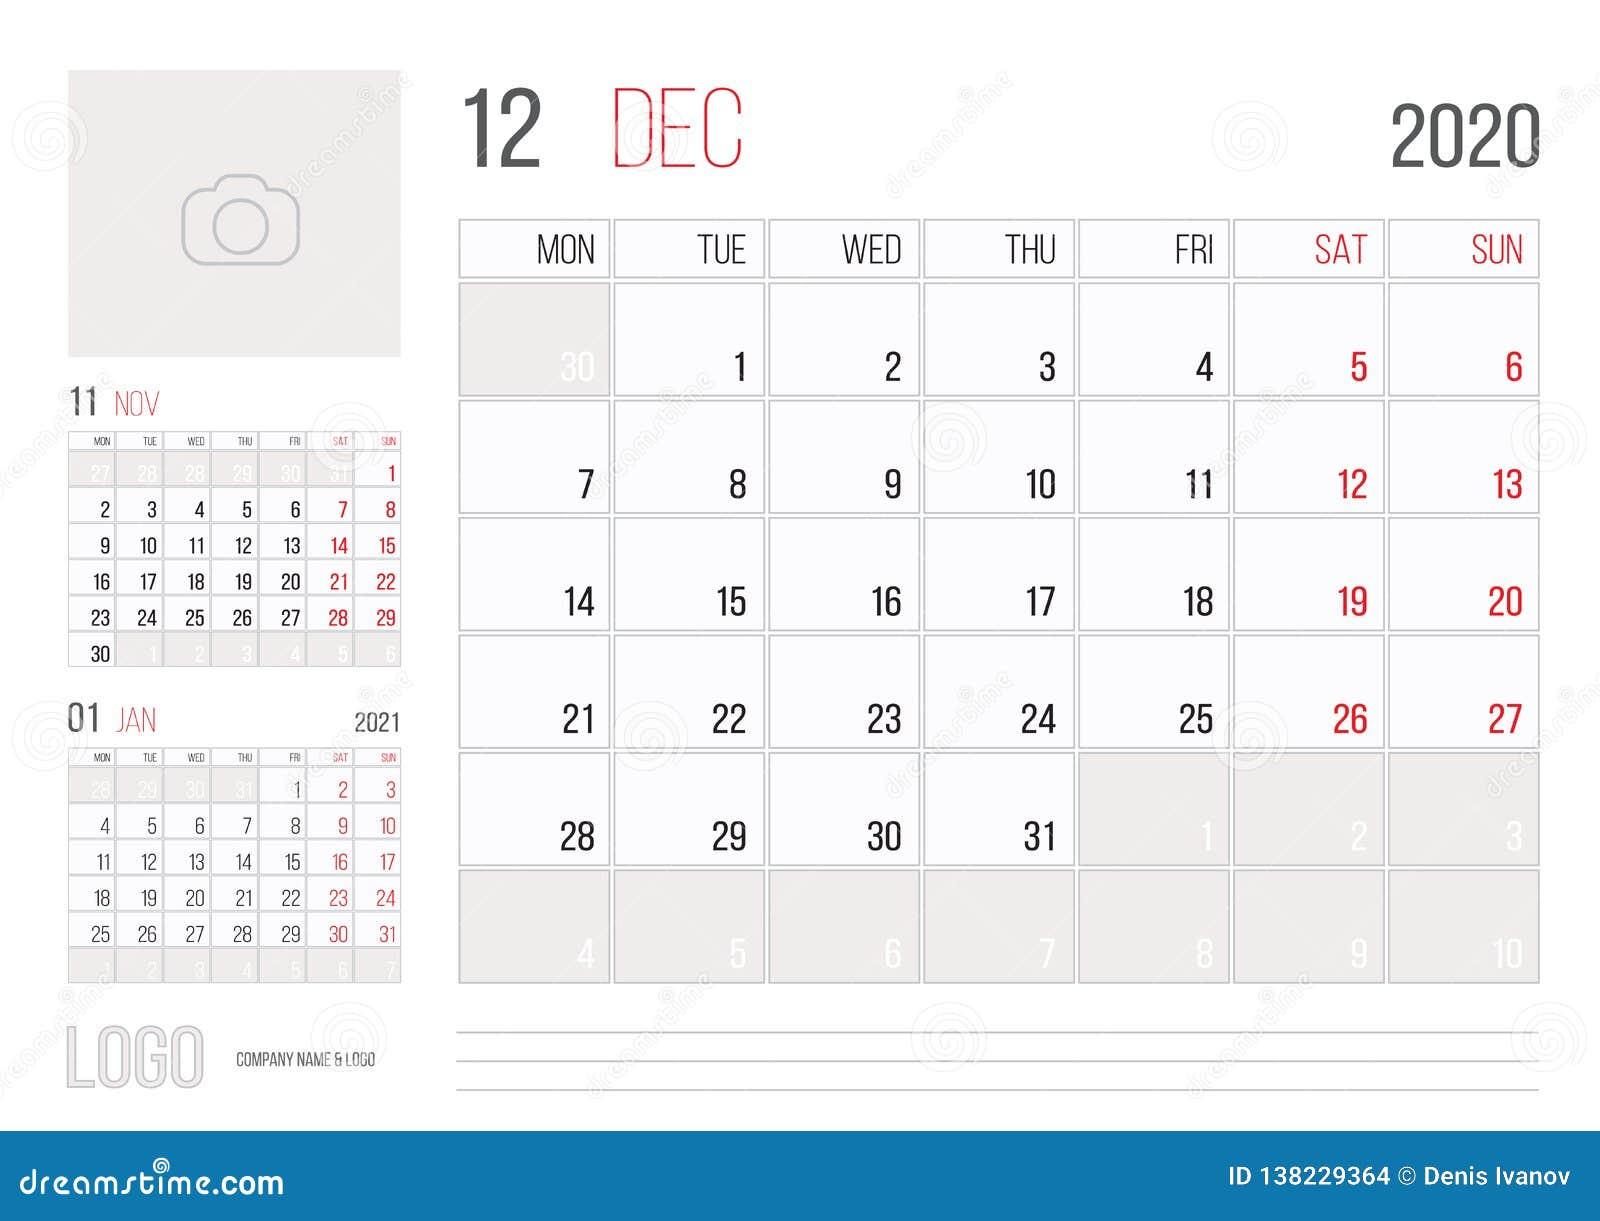 December Calendar 2020.Calendar 2020 Planner Corporate Template Design December Month Stock